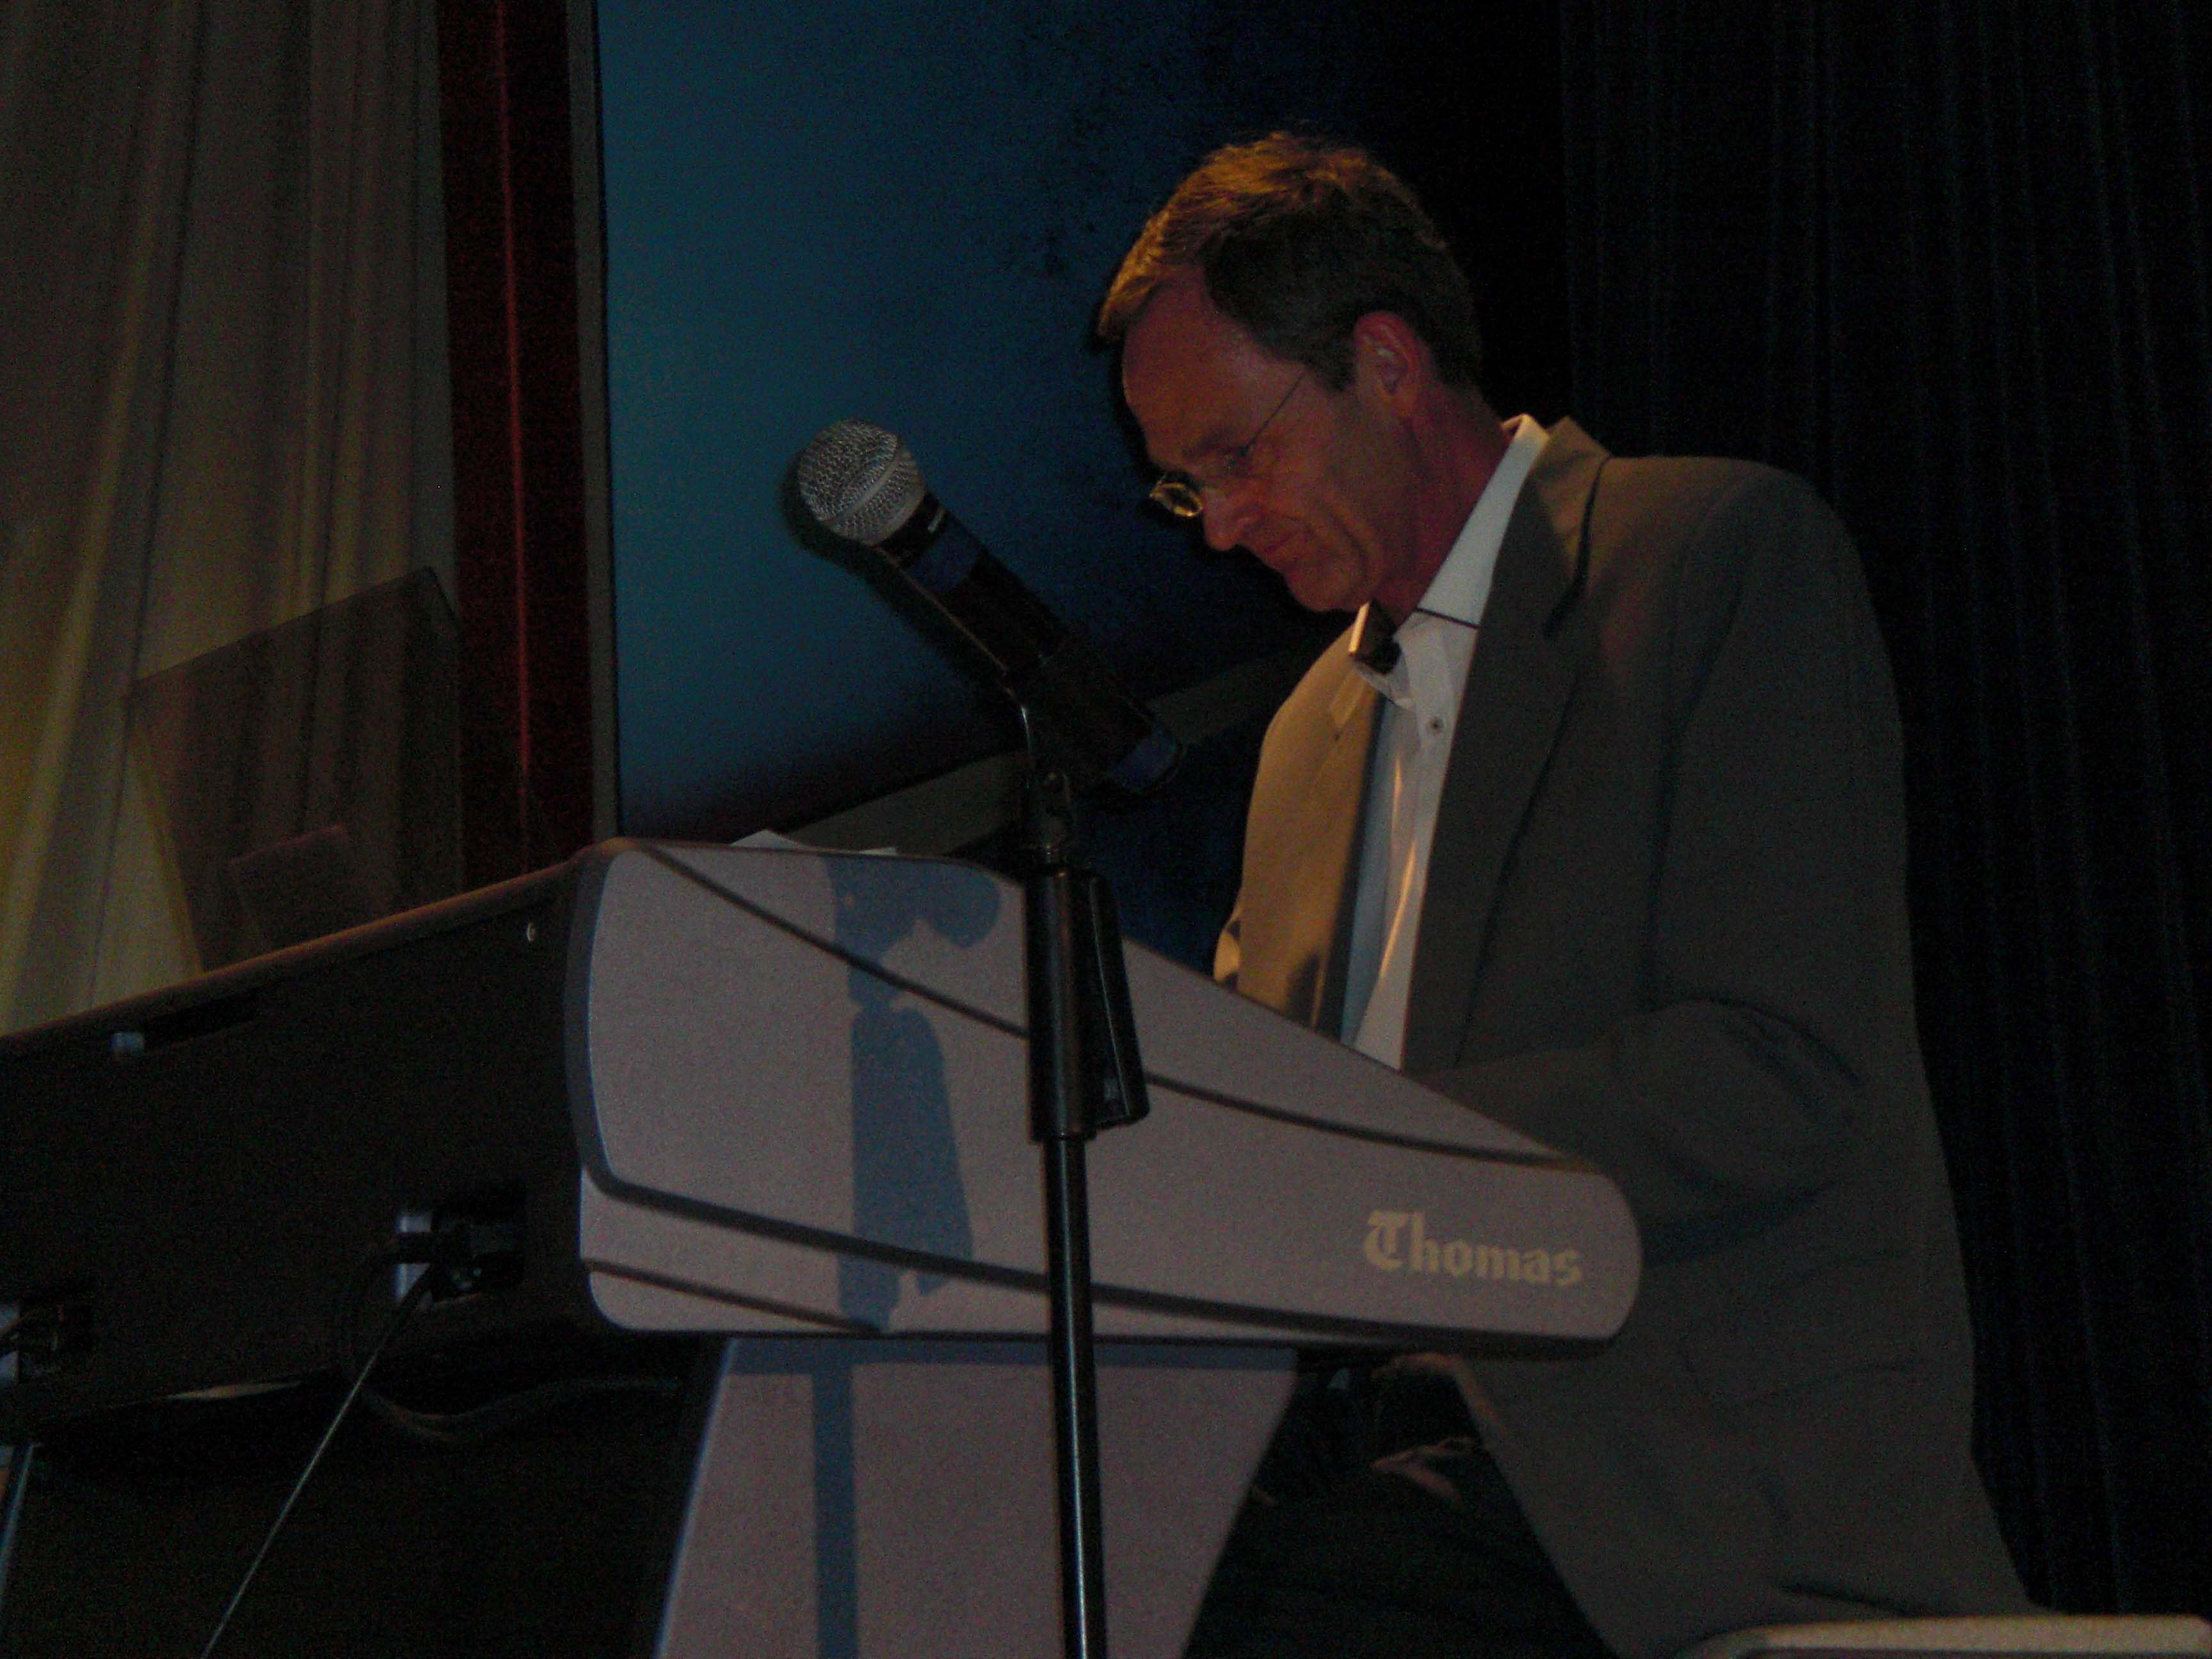 http://www.thomas-music.de/media/Pakefield_2011/CIMG1007.jpg